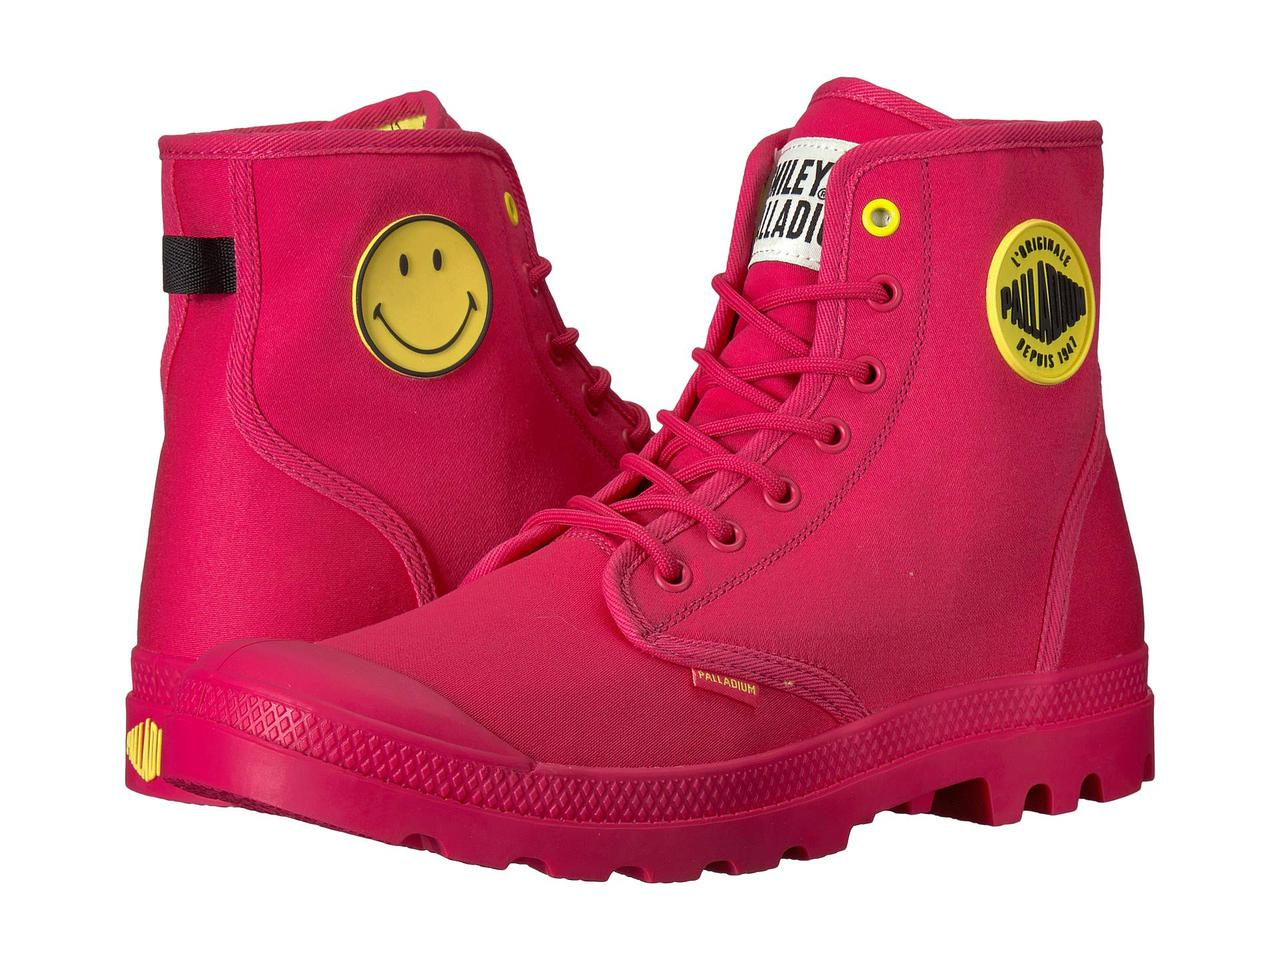 Ботинки Сапоги (Оригинал) Palladium Pampa Smiley Festbag Azalea — в ... 0697104184f4a